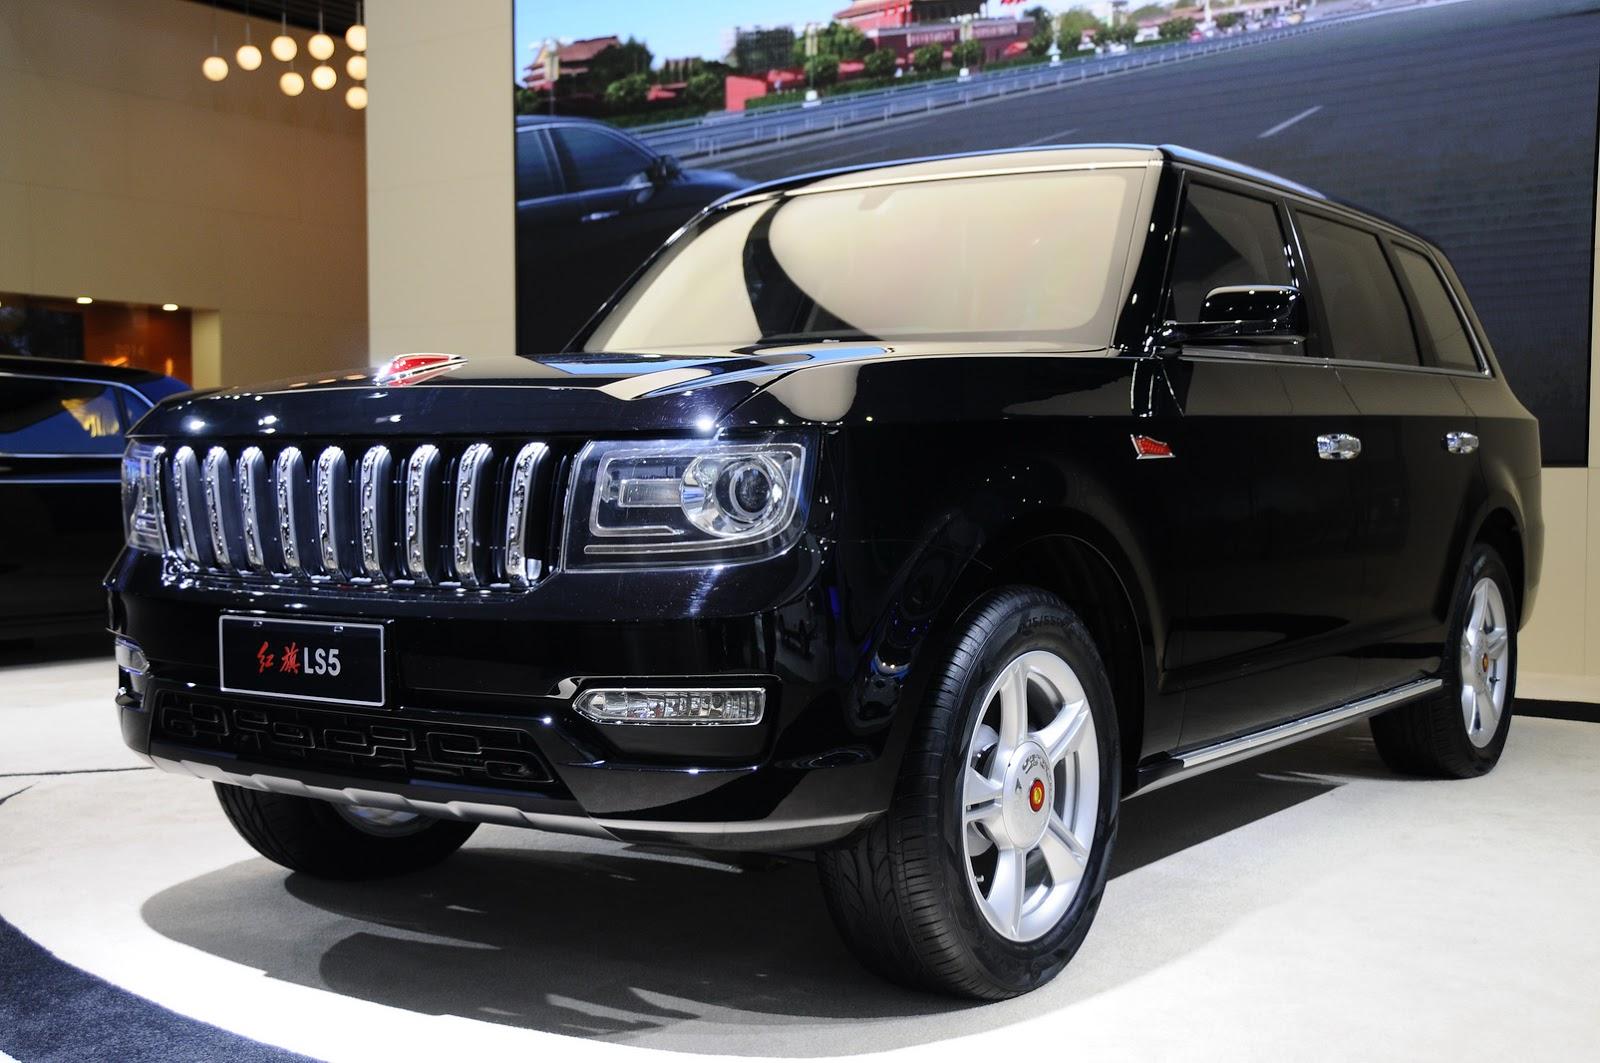 2015 - [Chine] Salon Auto de Shanghai - Page 2 Hongqi-LS5-1